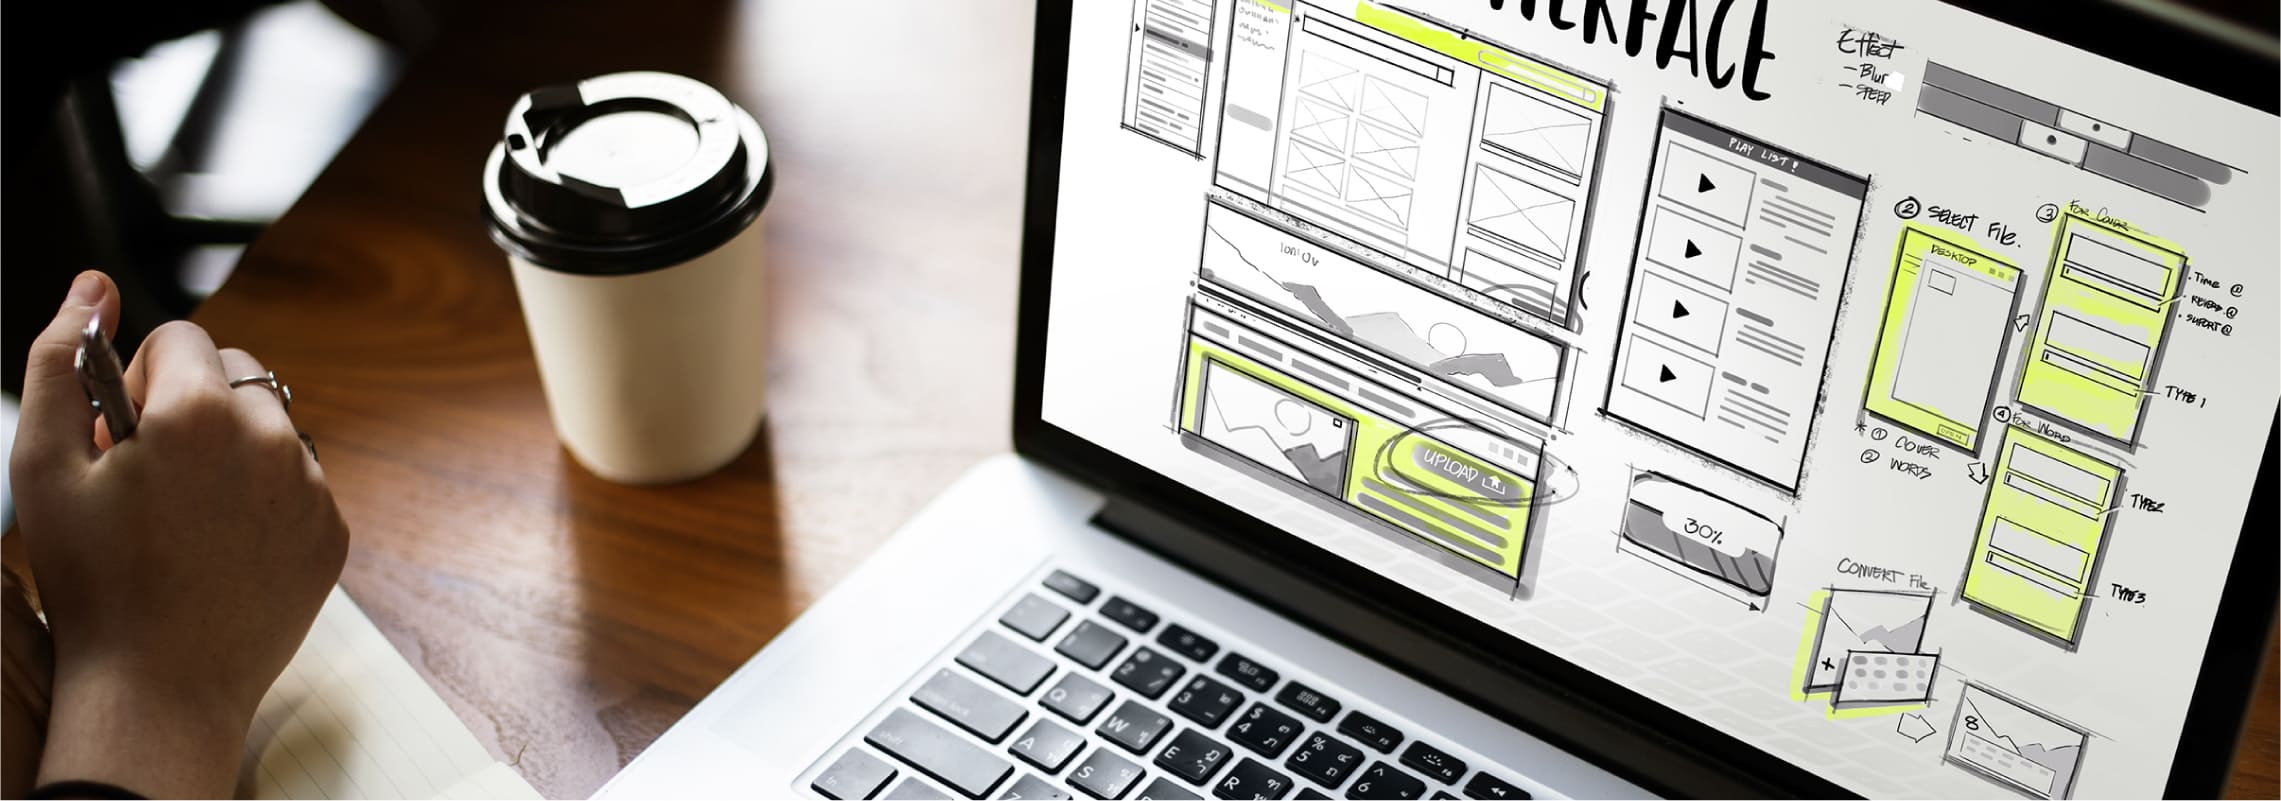 Web事業のメイン画像